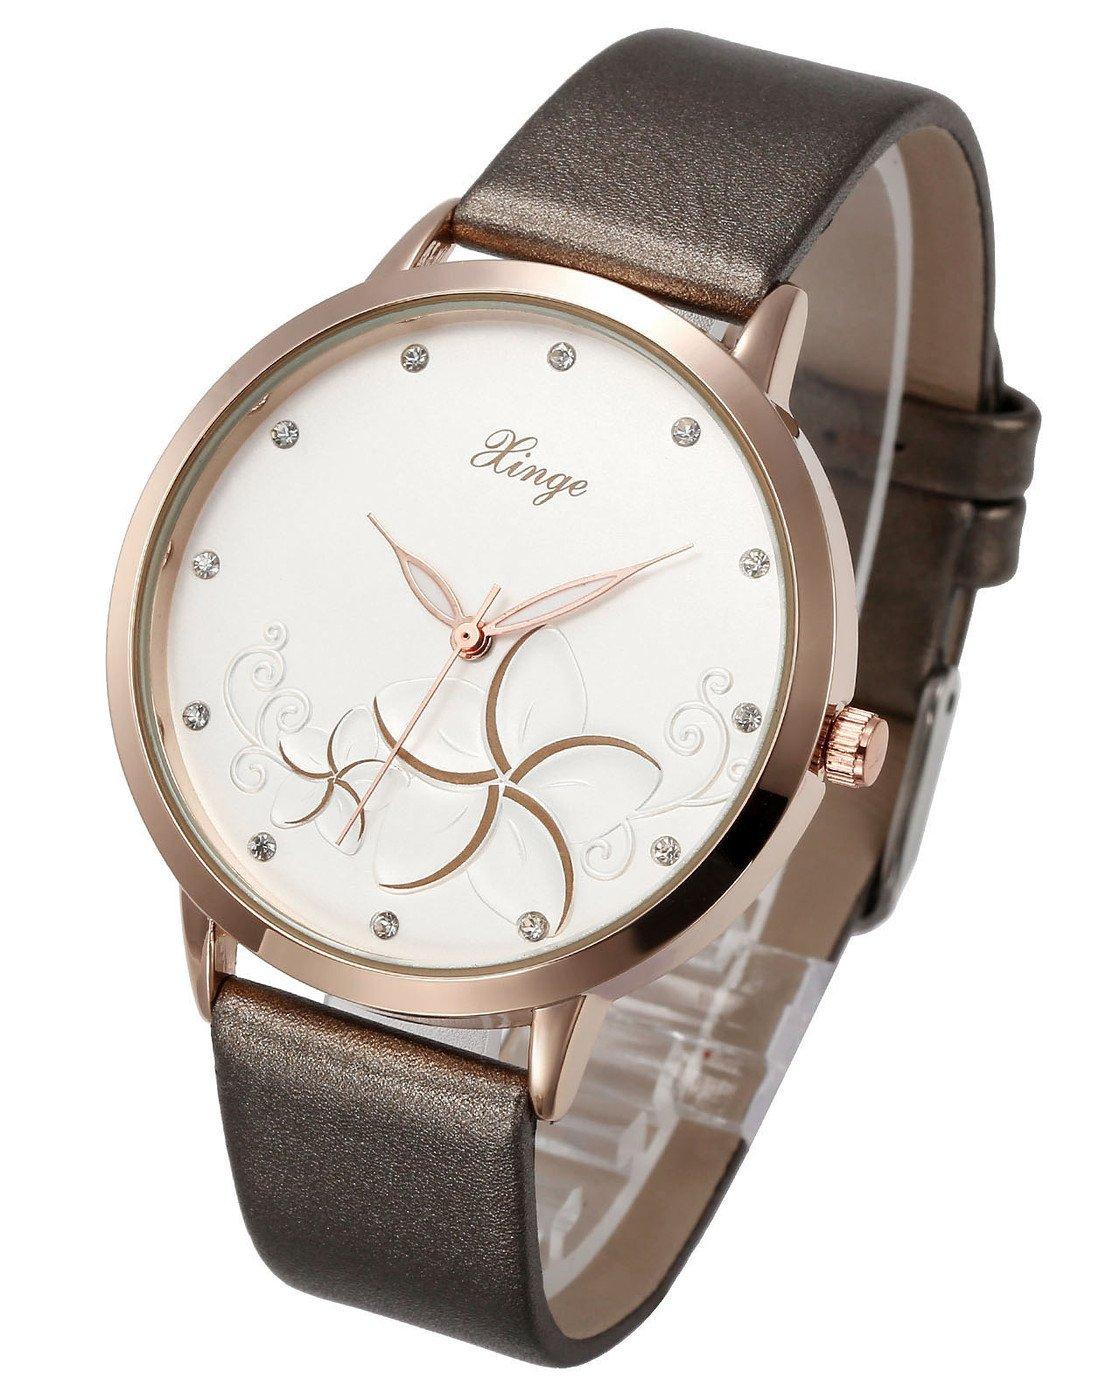 Top Plaza Women Ladies Luxury Elegant Rose Gold Case PU Leather Band Flower Pattern Rhinestones Business Analog Quartz Wristwatch 30M Waterproof - Gray